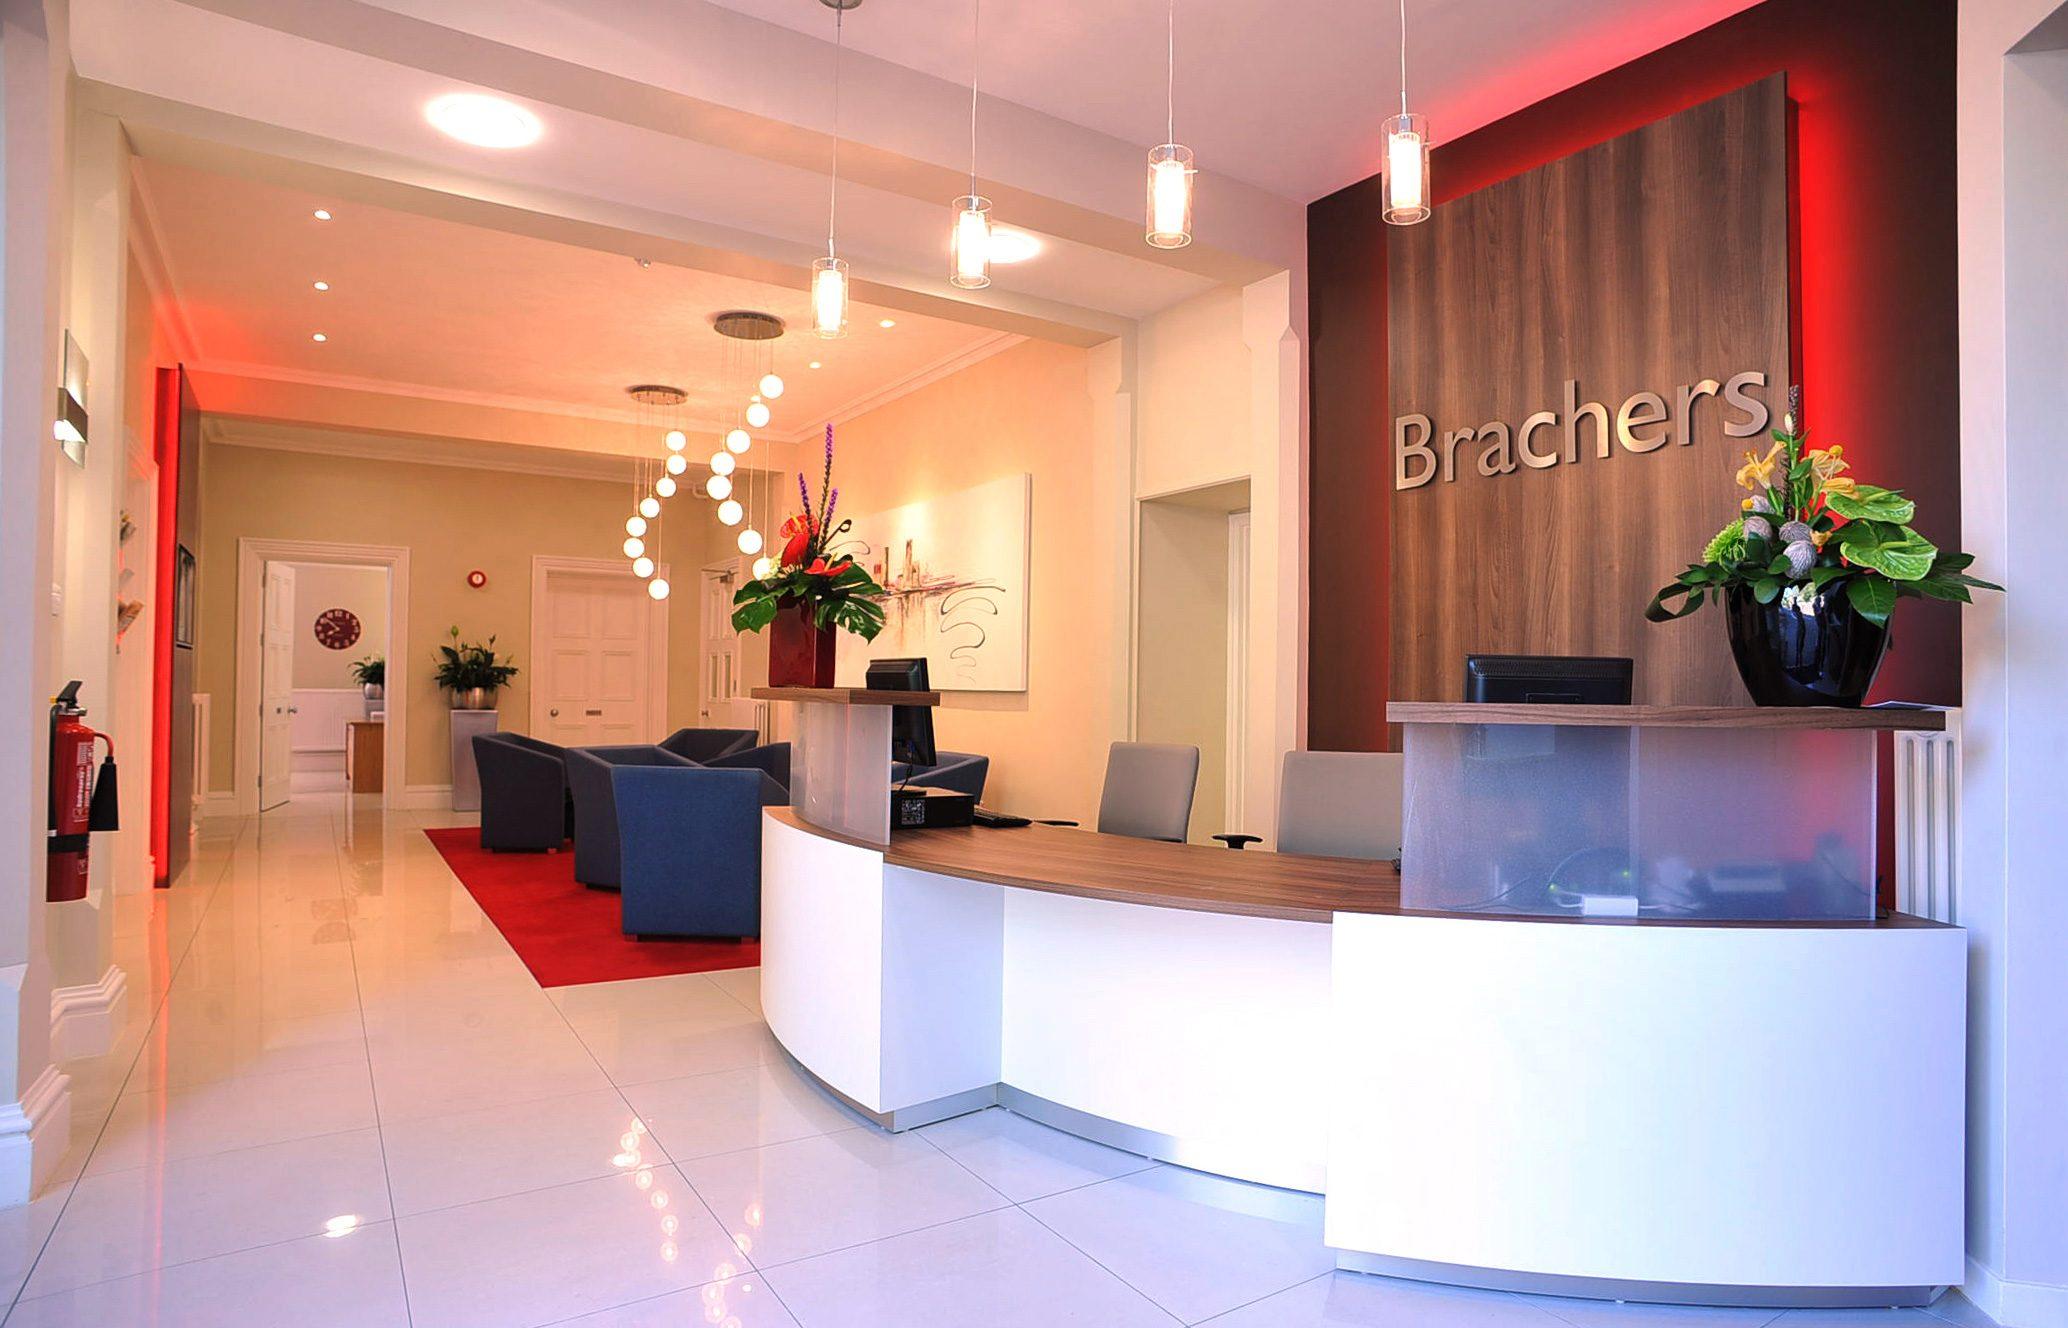 Brachers Solicitors - Enaflo Interiors